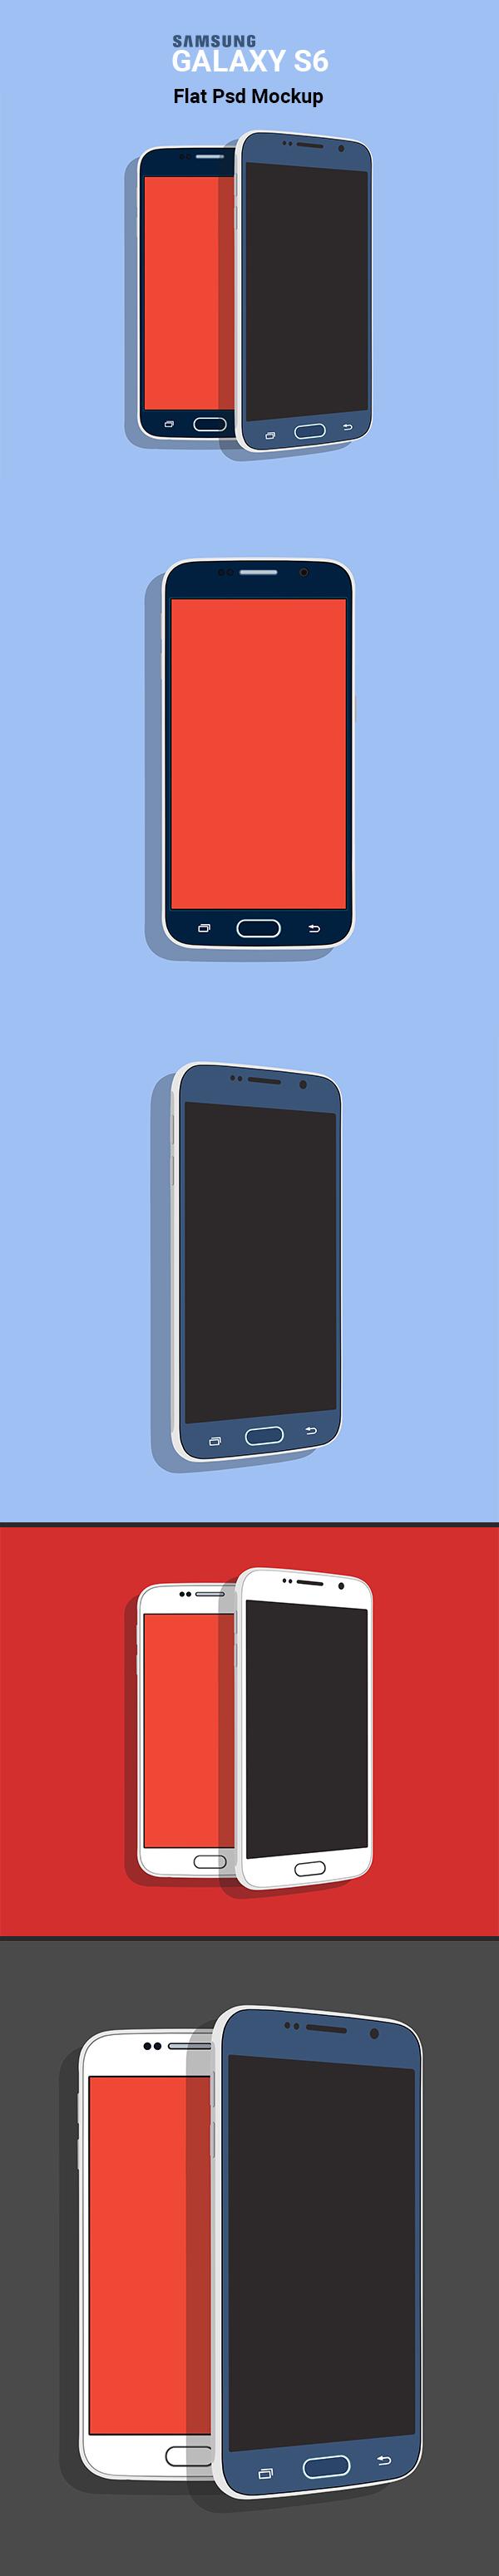 Samsung Galaxy s6 Galaxy S6 PSD psd free Flat PSD Mockup flat psd S6 Flat PSD Galaxy S6 Mockup